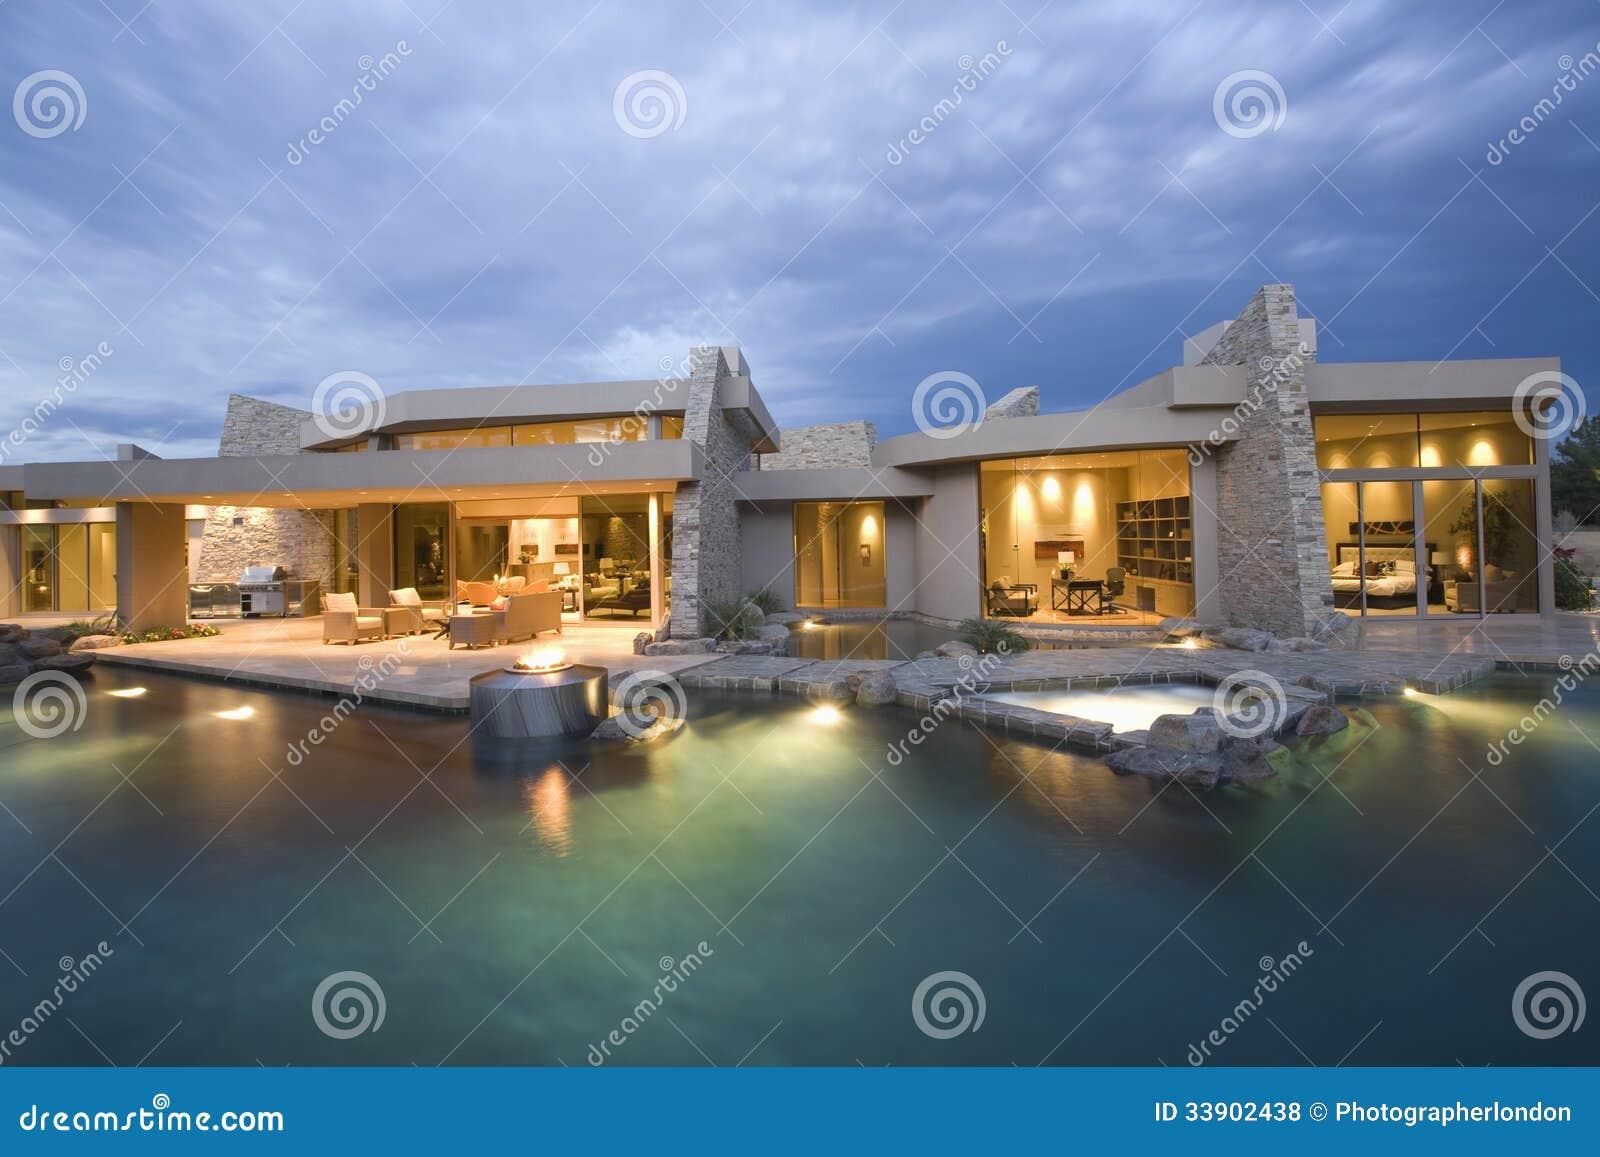 Huis Modern Huis : Swimming pool and illuminated modern house stock photo image of